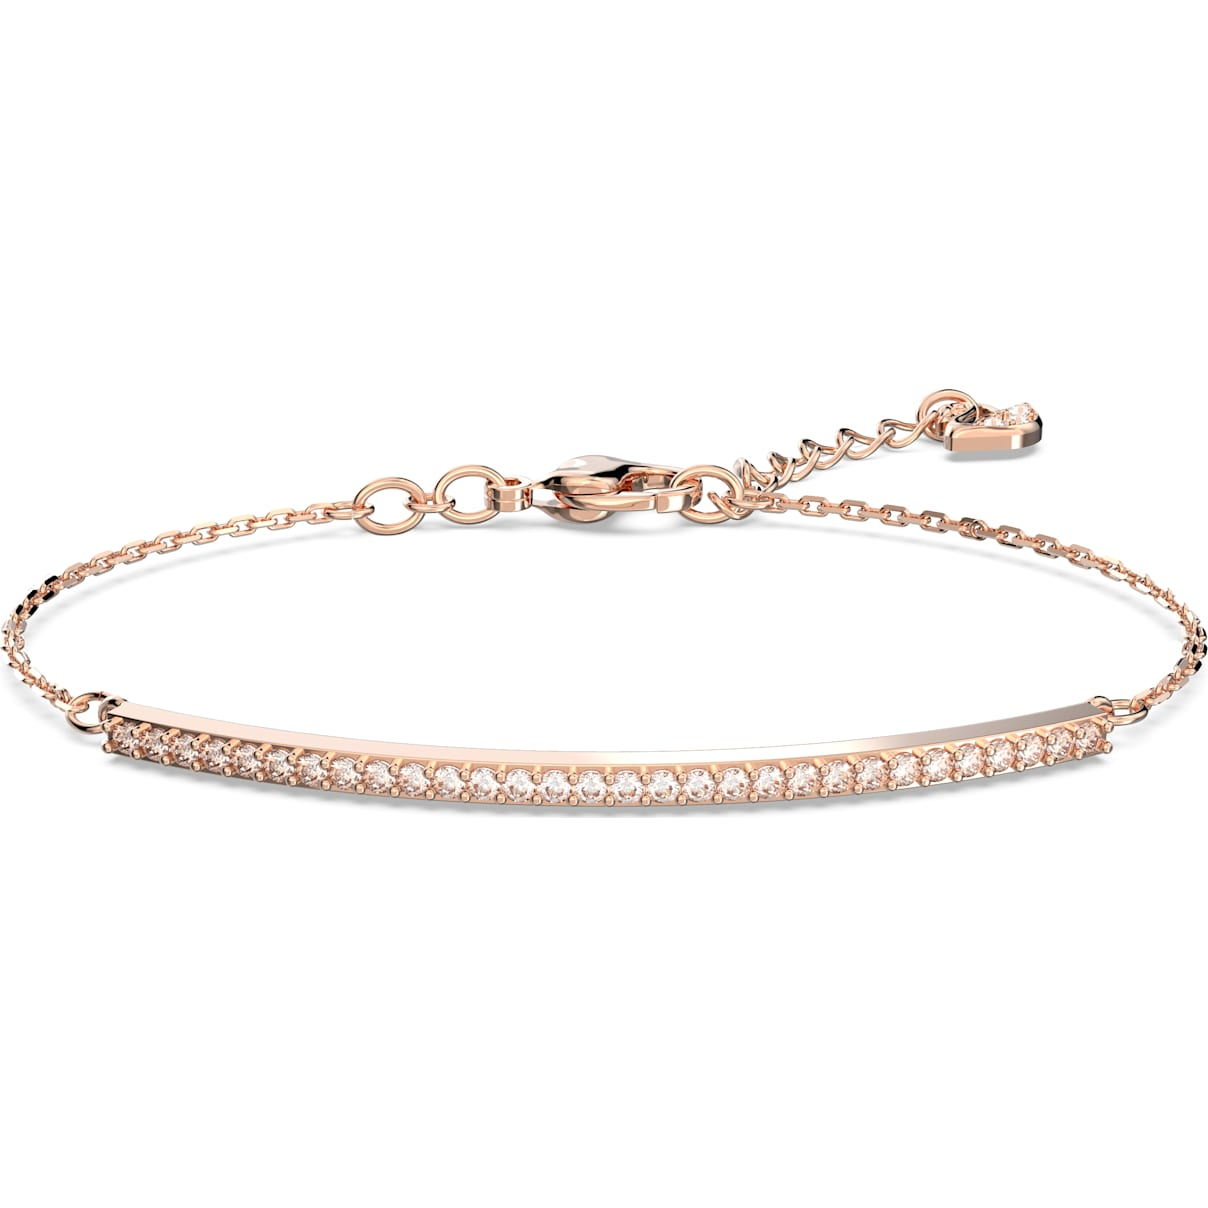 Swarovski Only Bracelet, White, Rose-gold tone plated